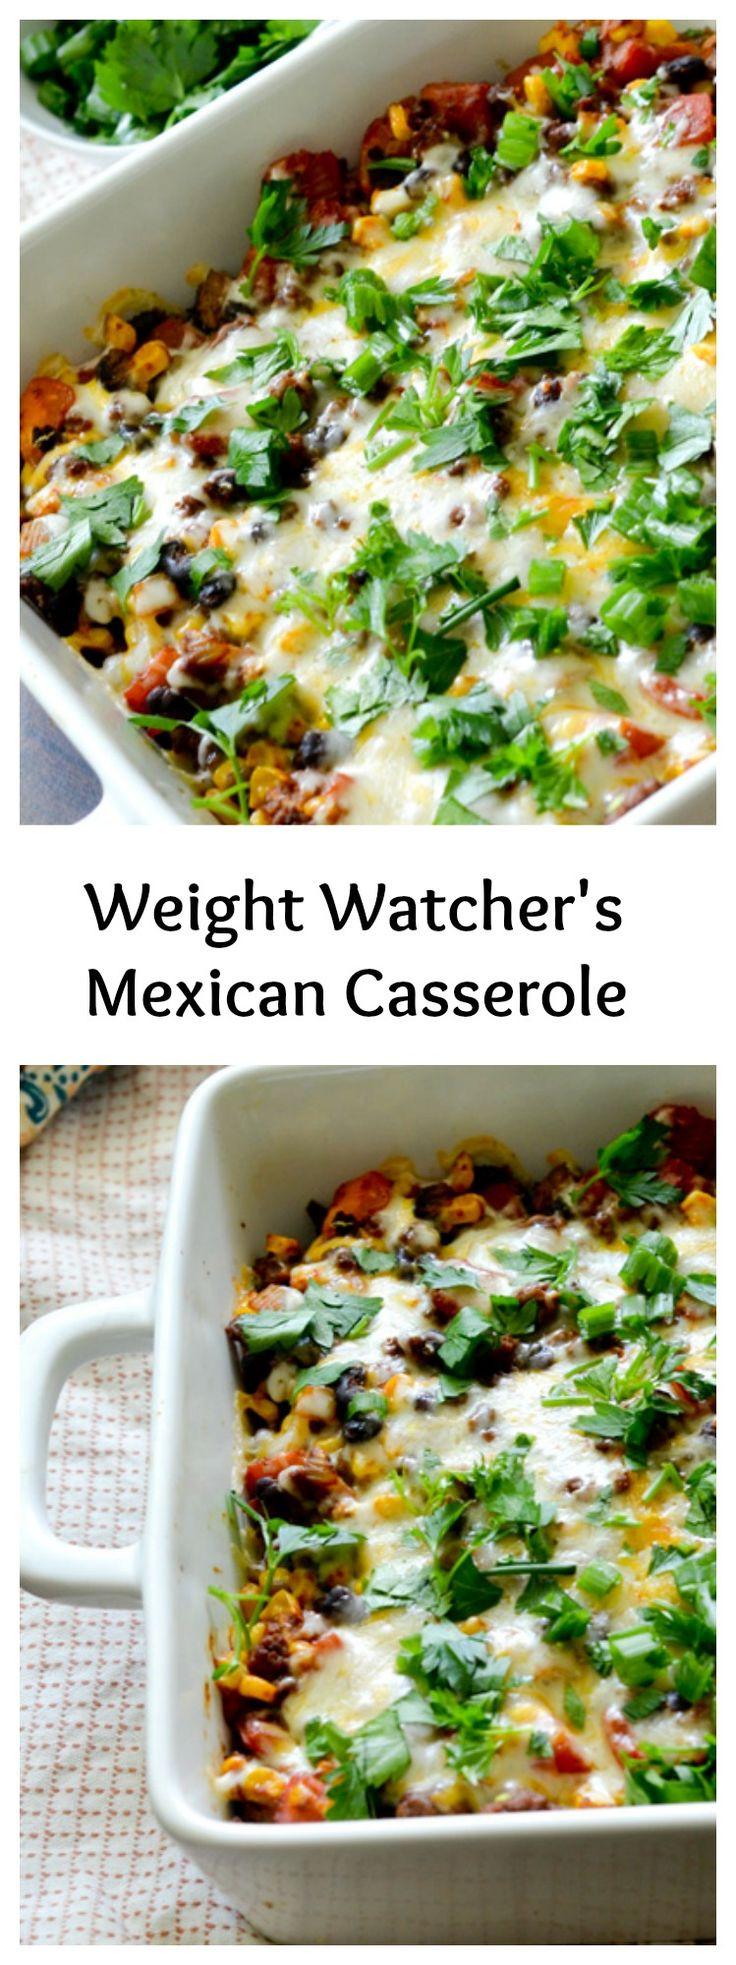 Healthy Mexican Casserole Recipe  HEALTYFOOD Diet to lose weight Weight Watcher s